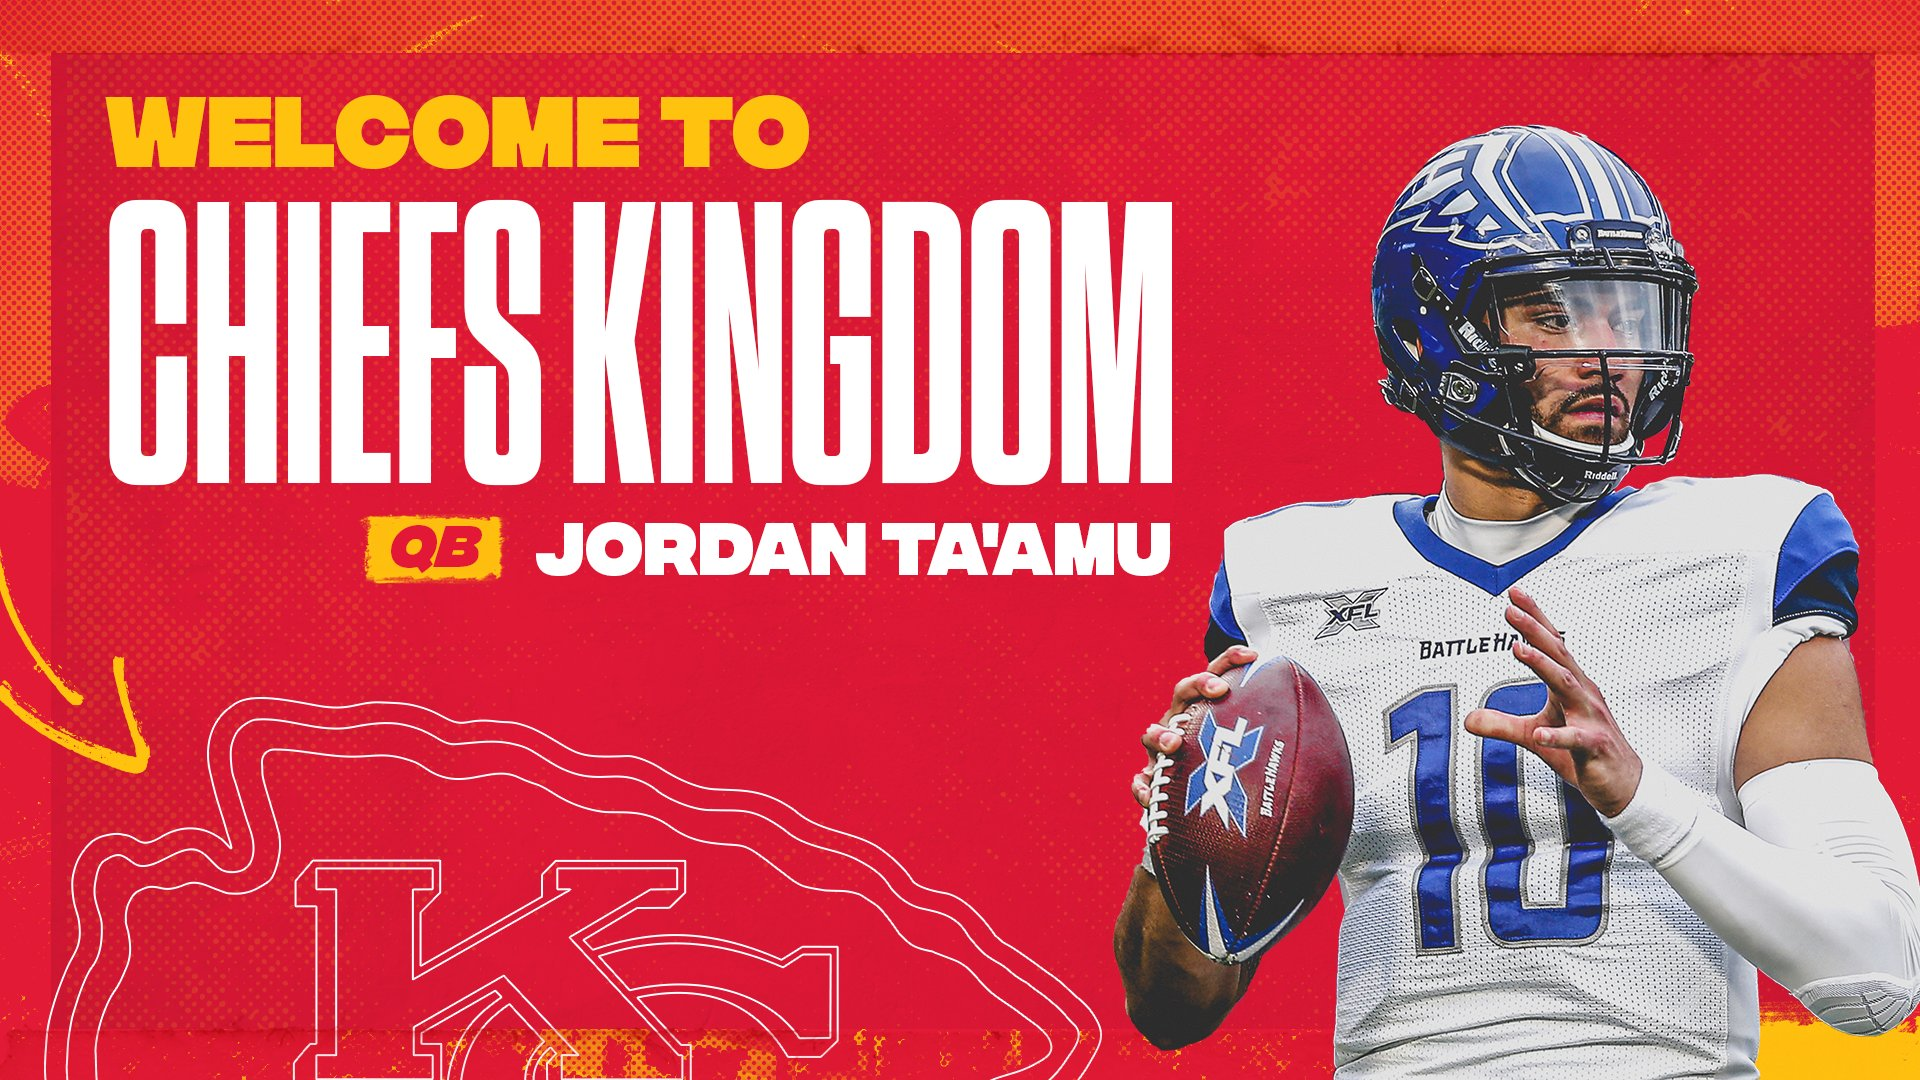 Kansas City Chiefs On Twitter We Ve Officially Signed Jordan Ta Amu